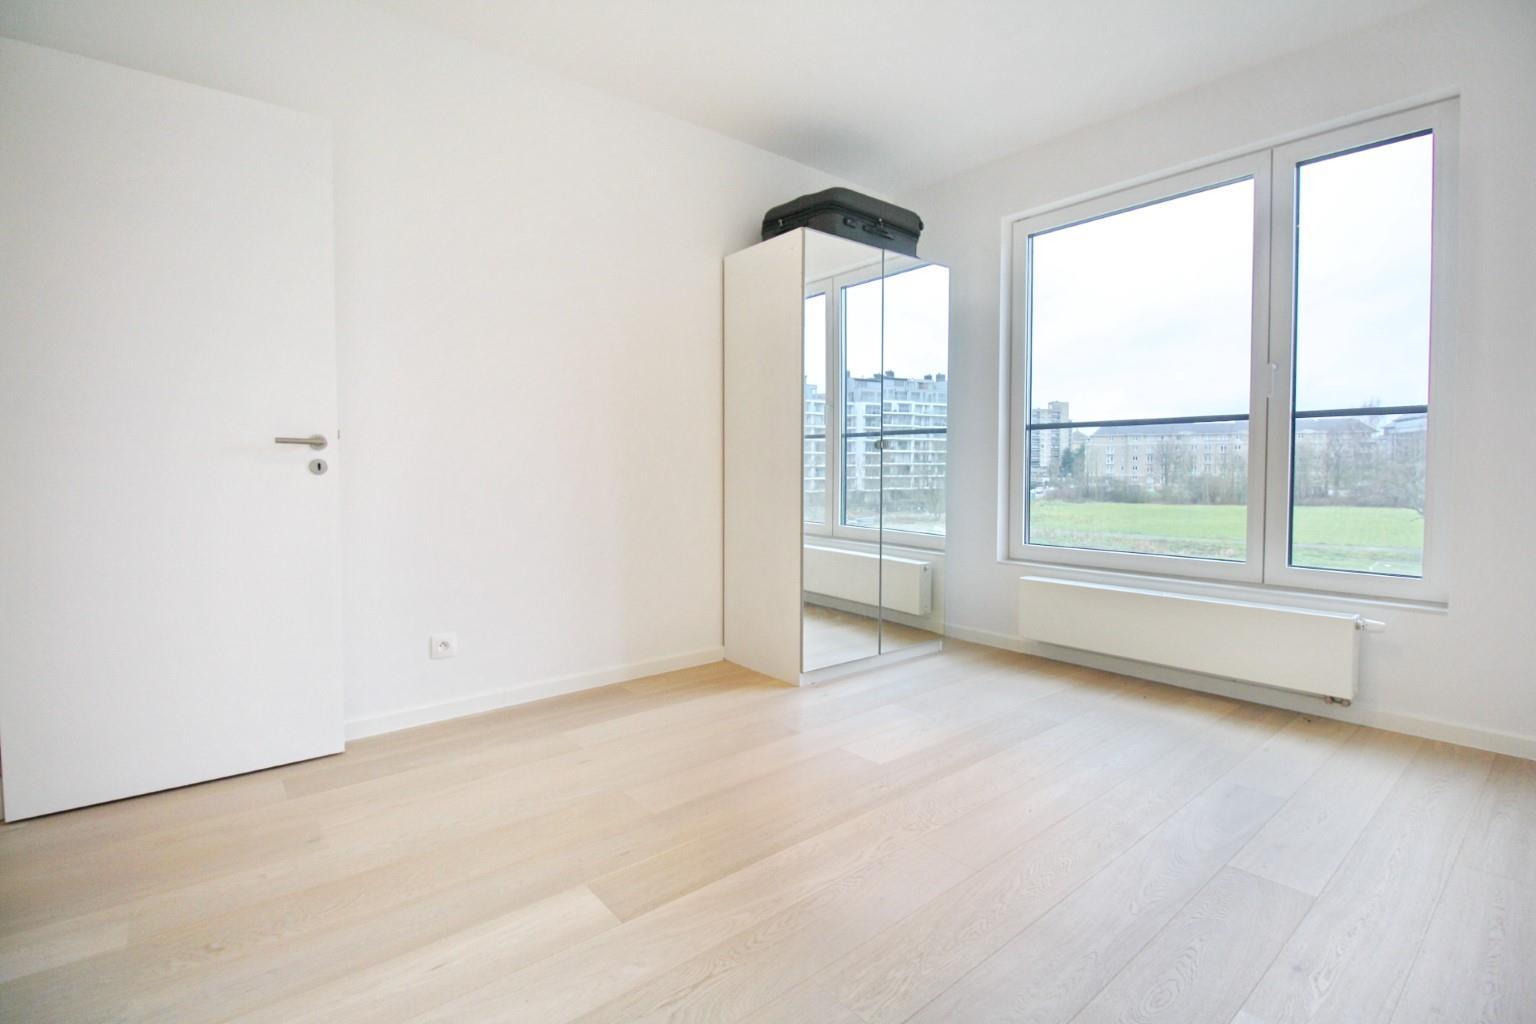 Appartement - Woluwe-Saint-Lambert - #3308144-16